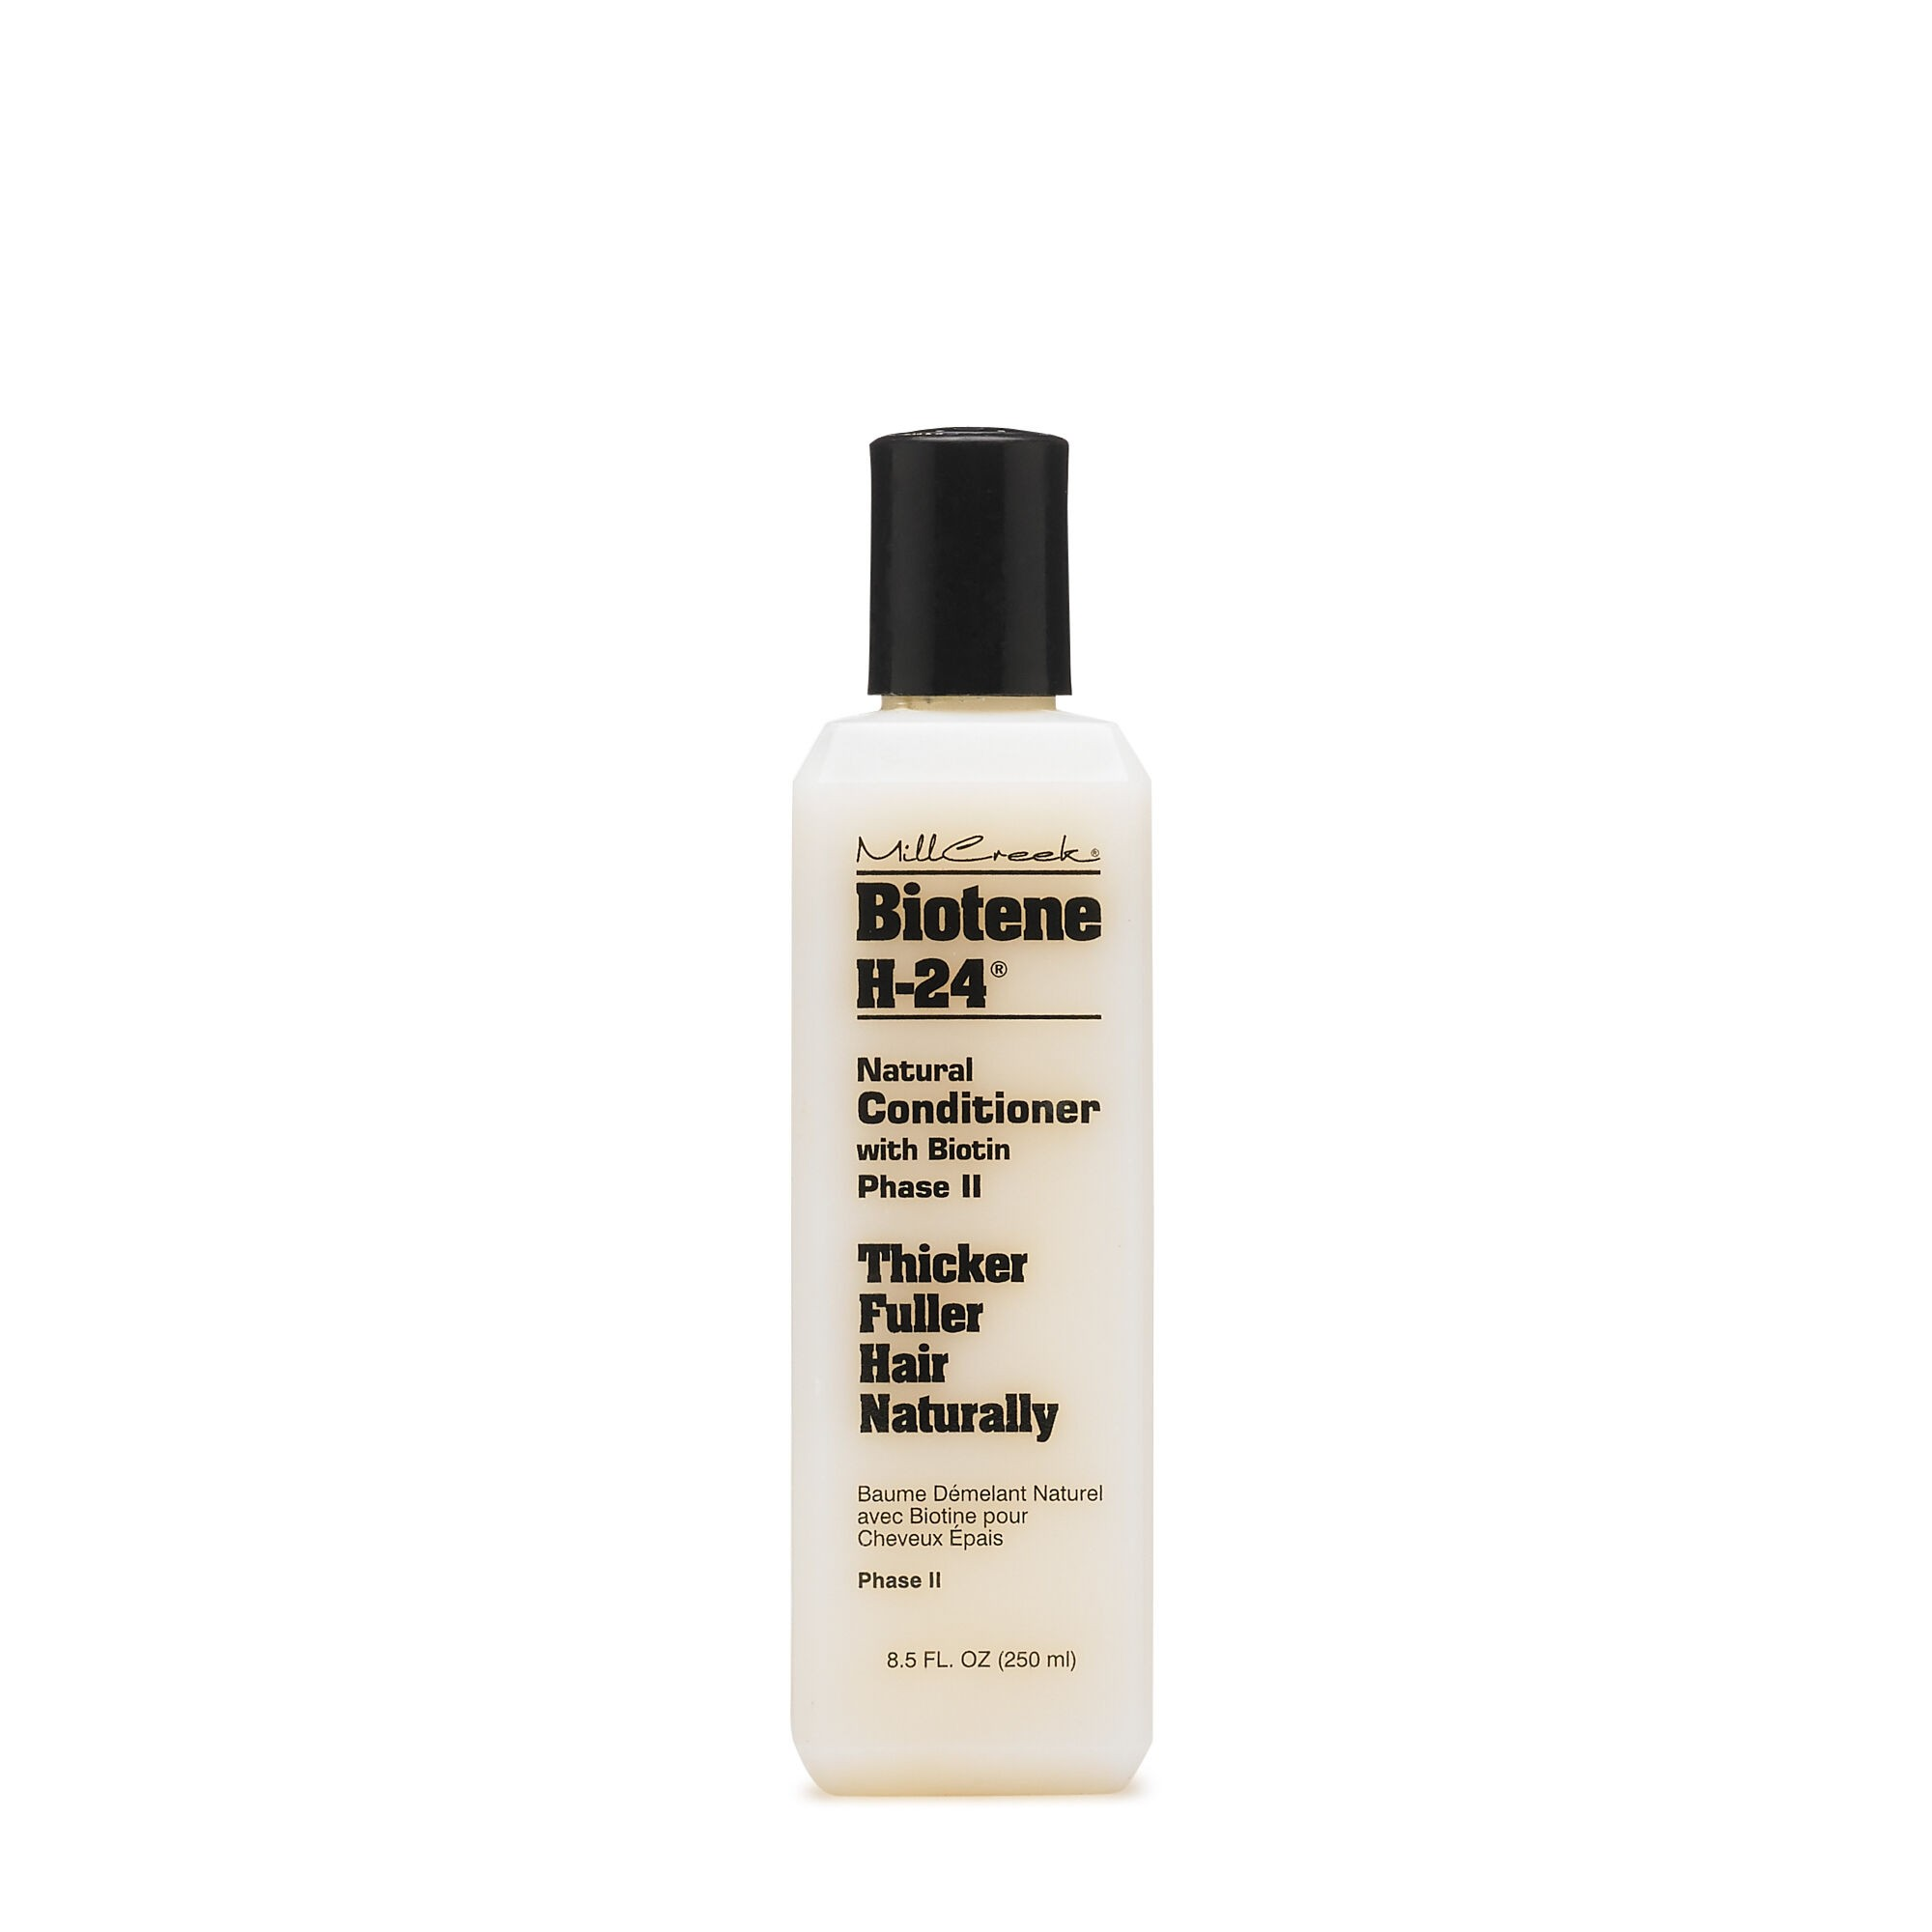 Mill Creek® Botanicals Biotene H-24® Natural Conditioner with Biotin, Balsam cu Biotina, 250 ml